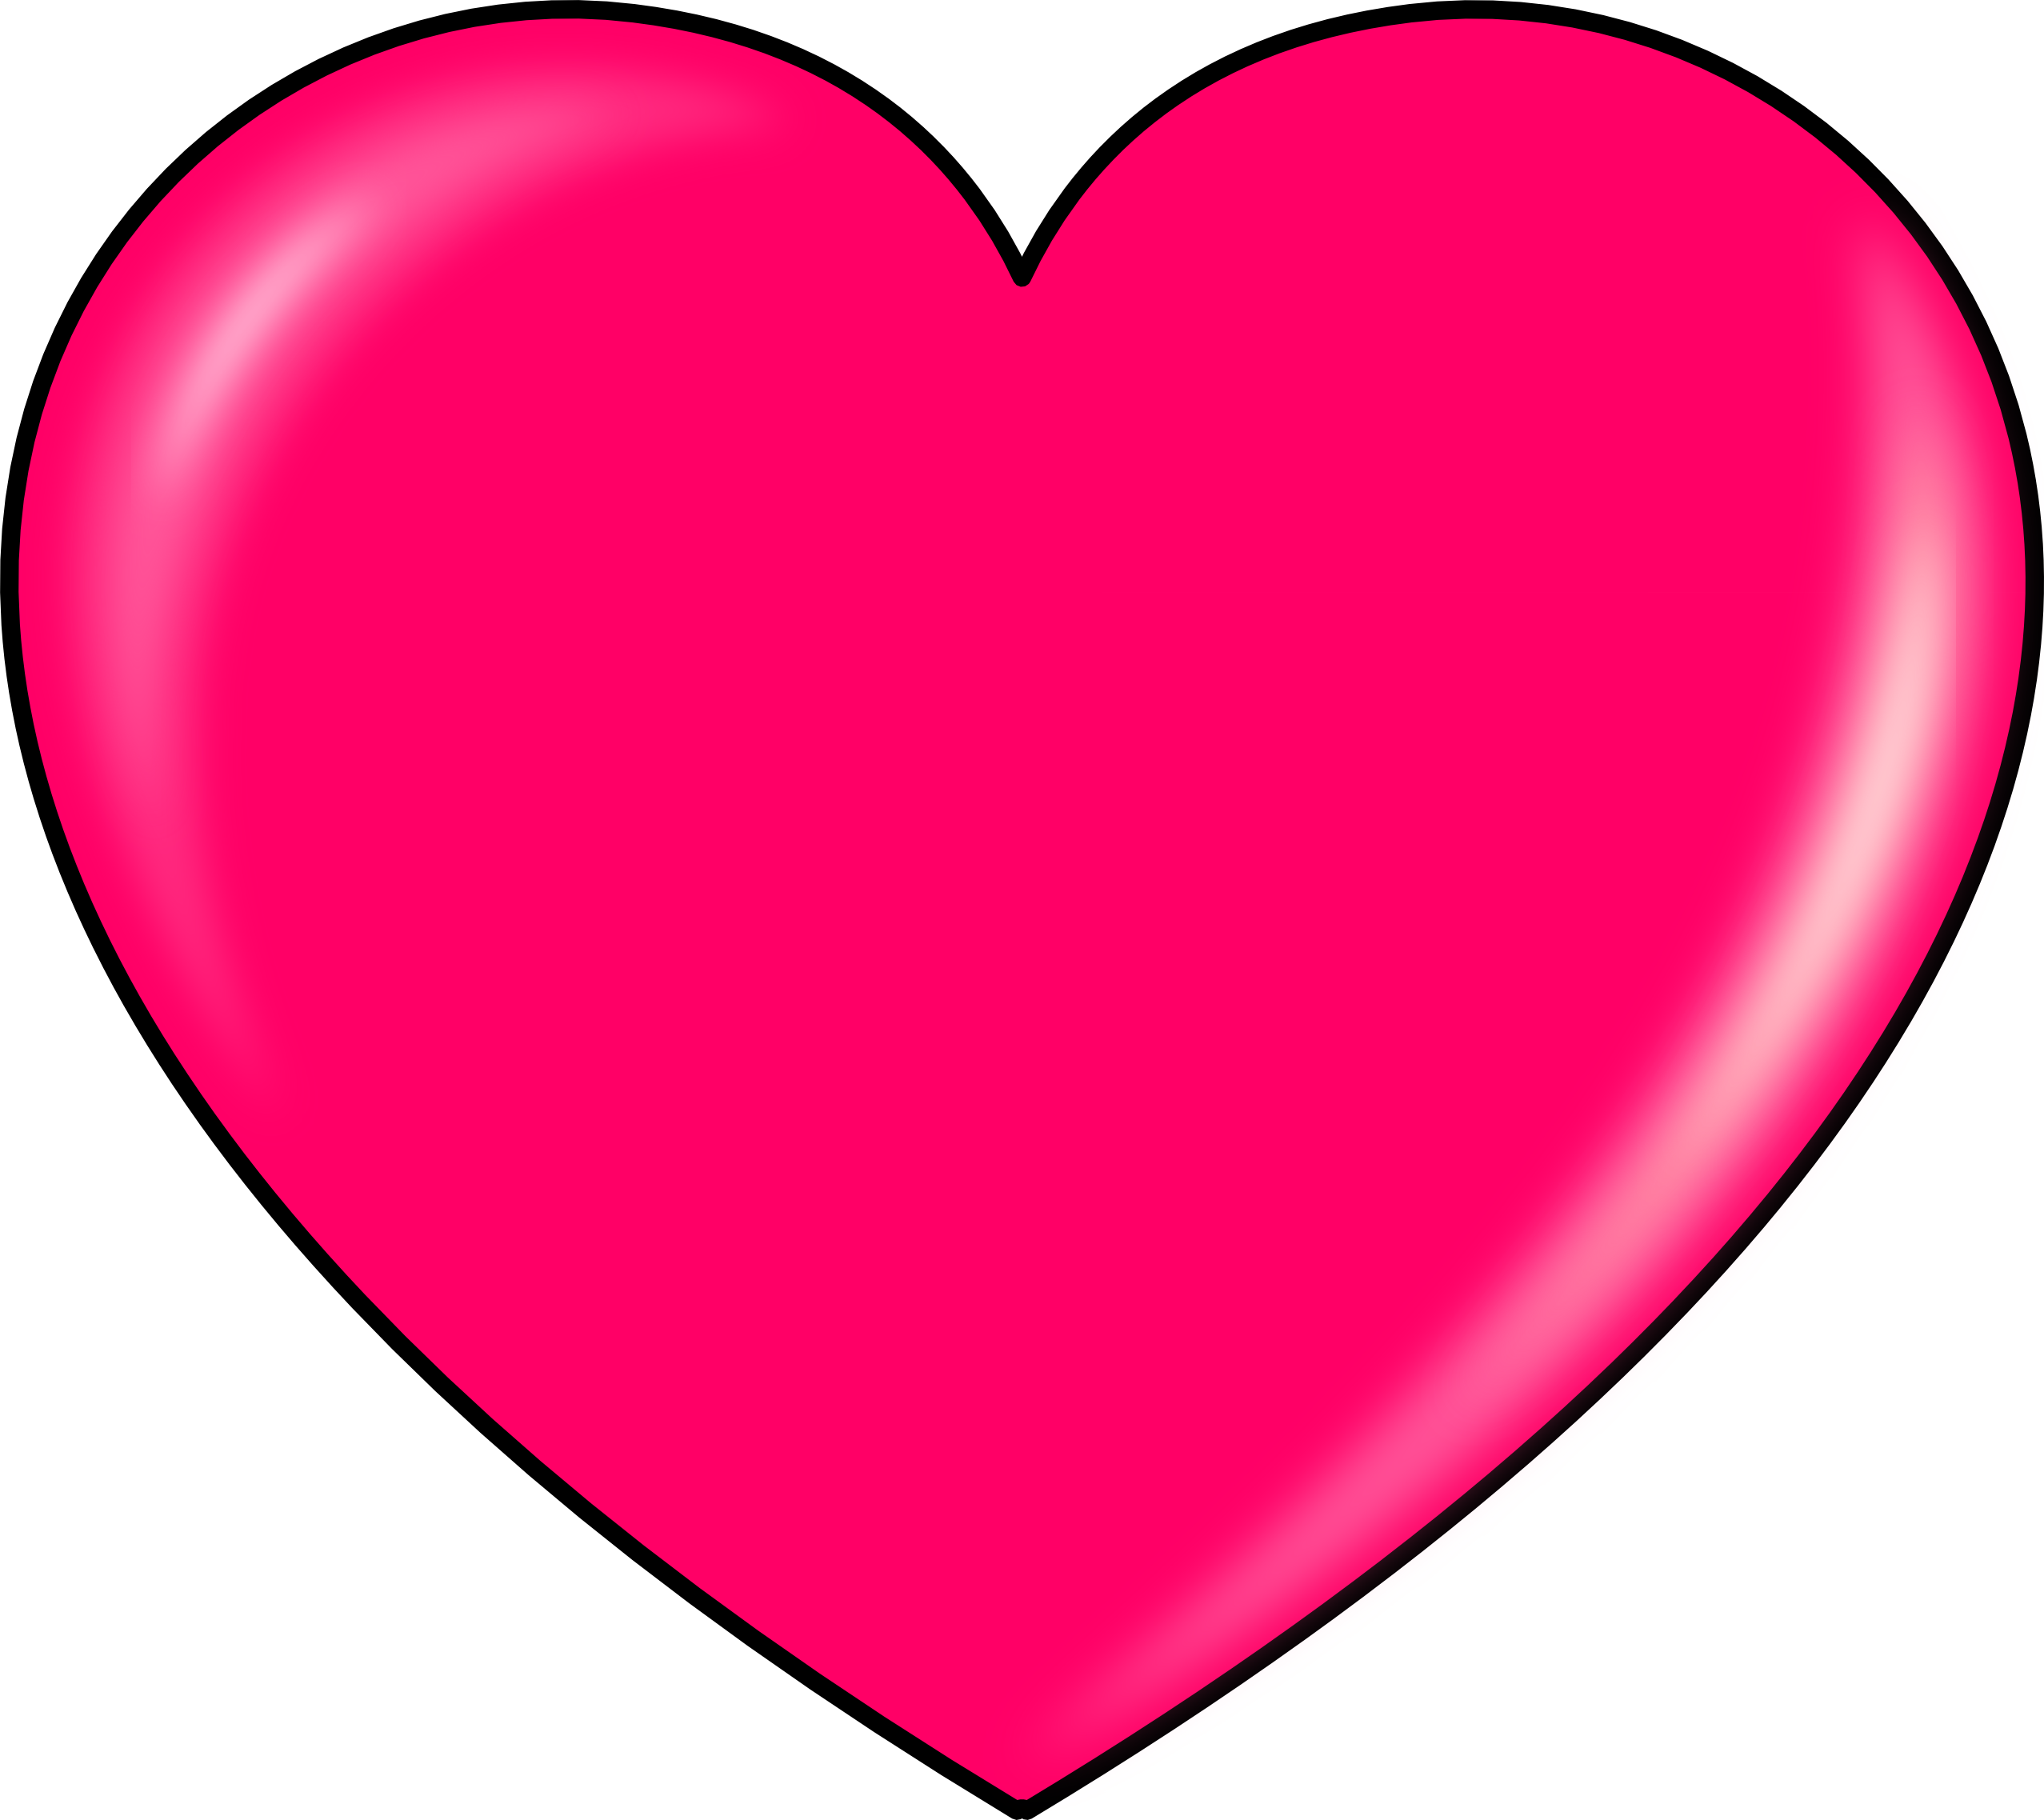 Heart PNG HD - 122756